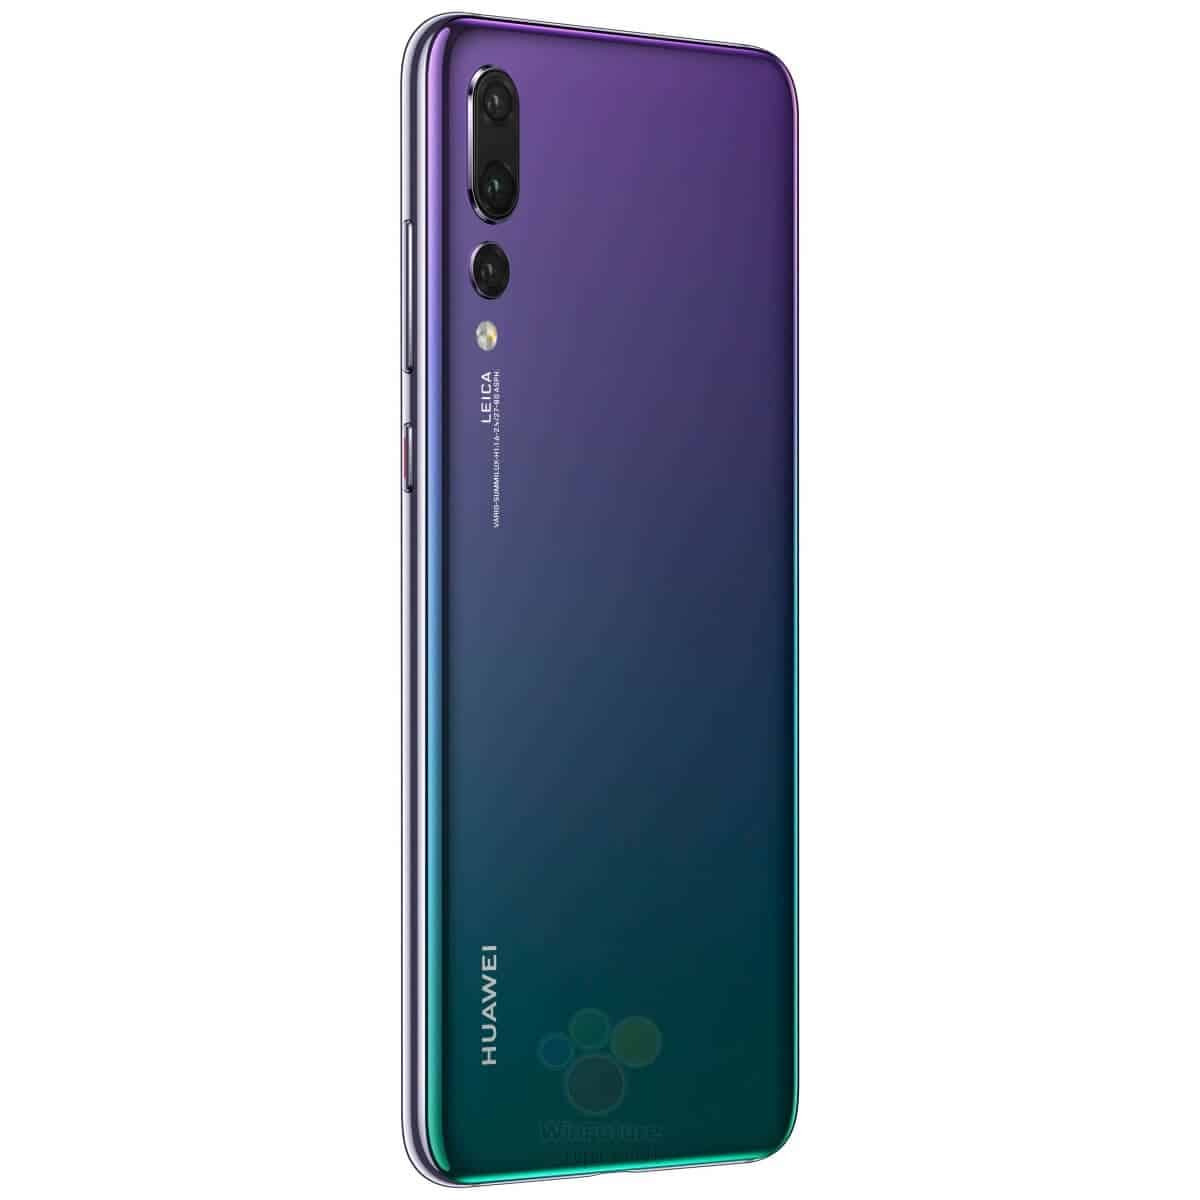 Huawei P20 Pro Press Renders 1